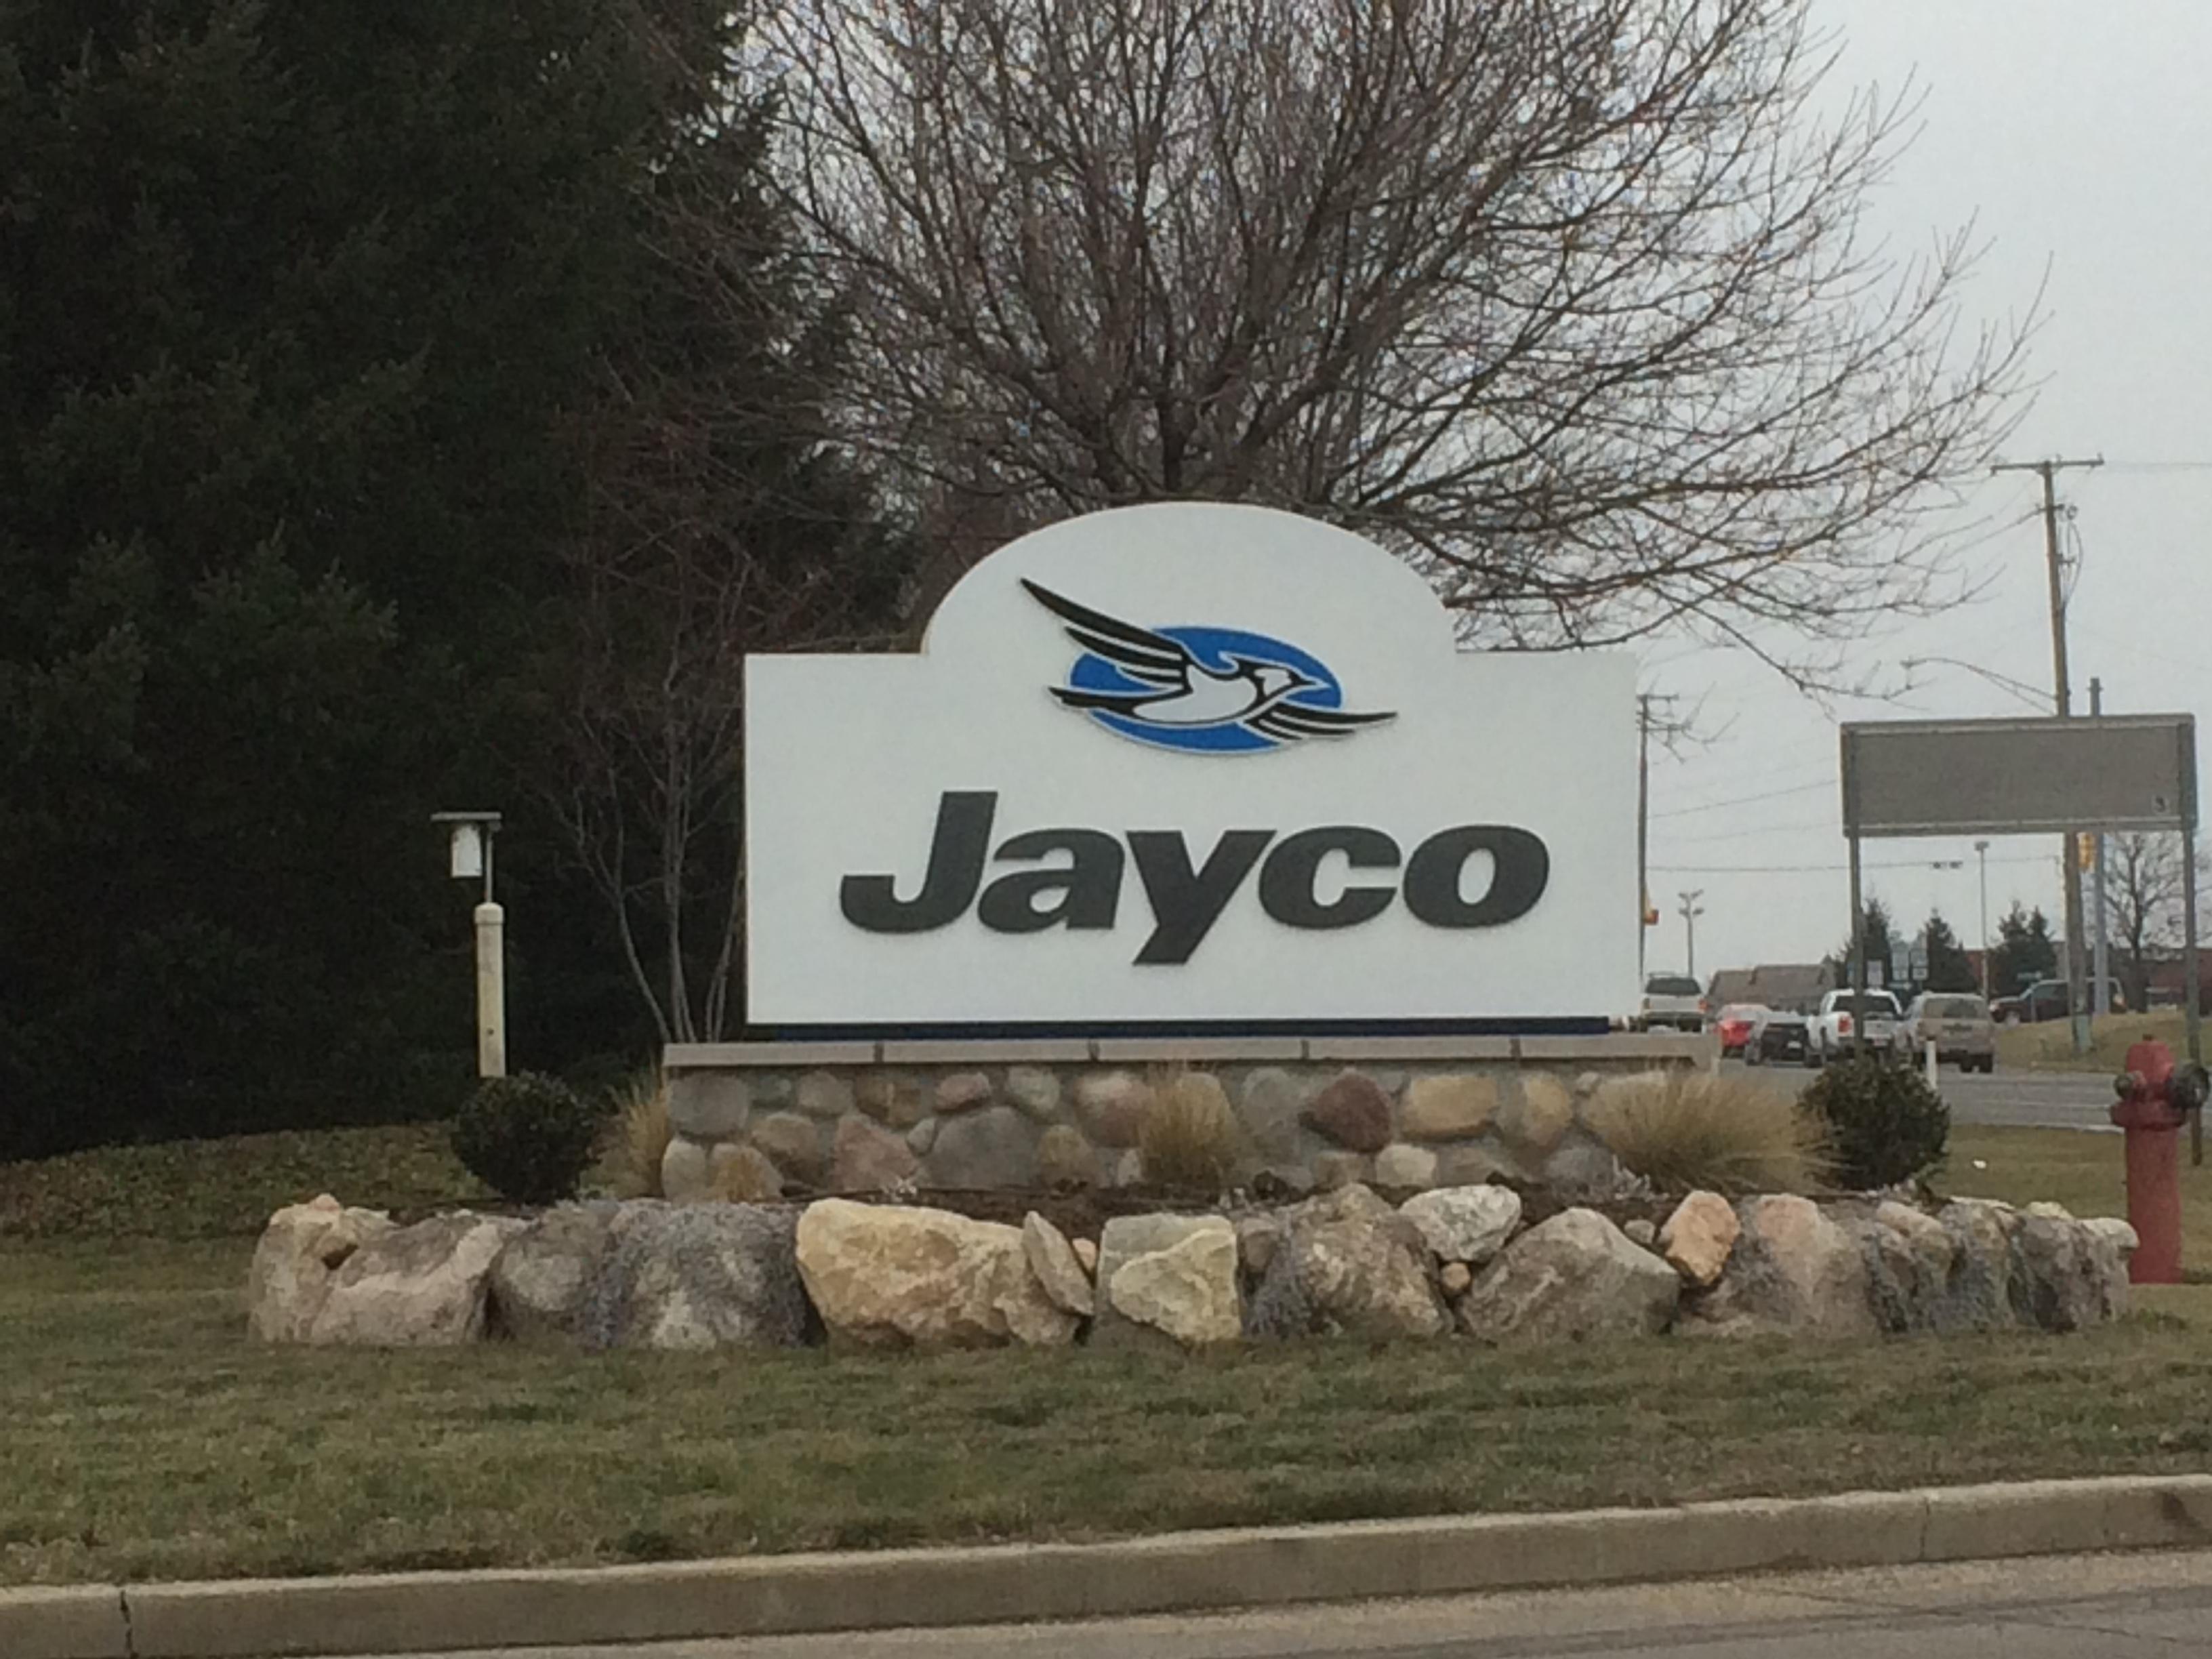 jayco_sign